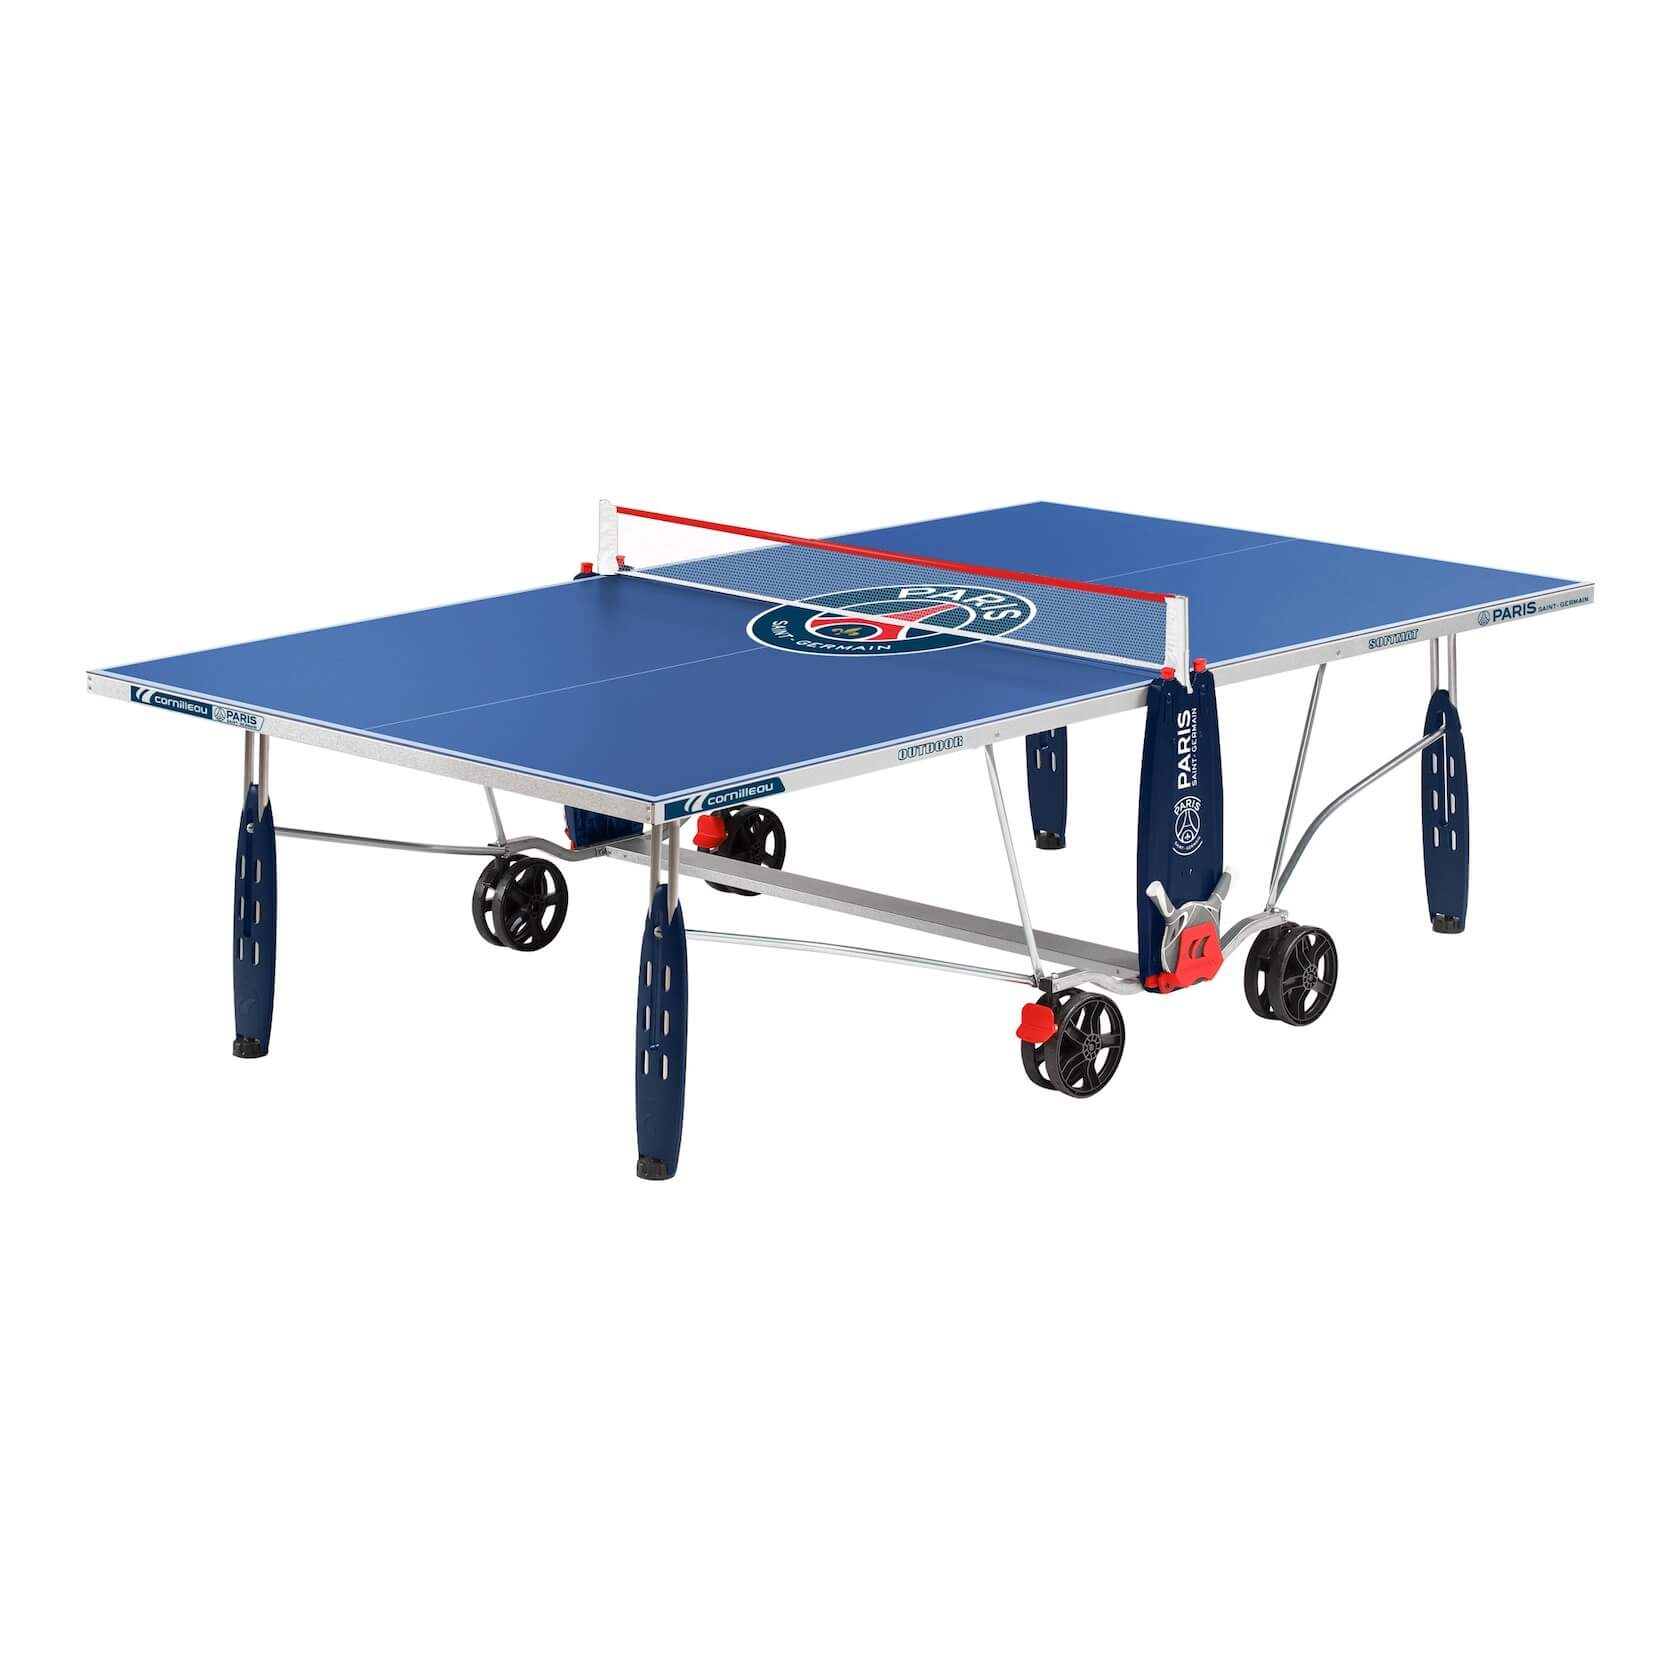 Теннисный стол Cornilleau SPORT PSG OUTDOOR blue 5 мм фото